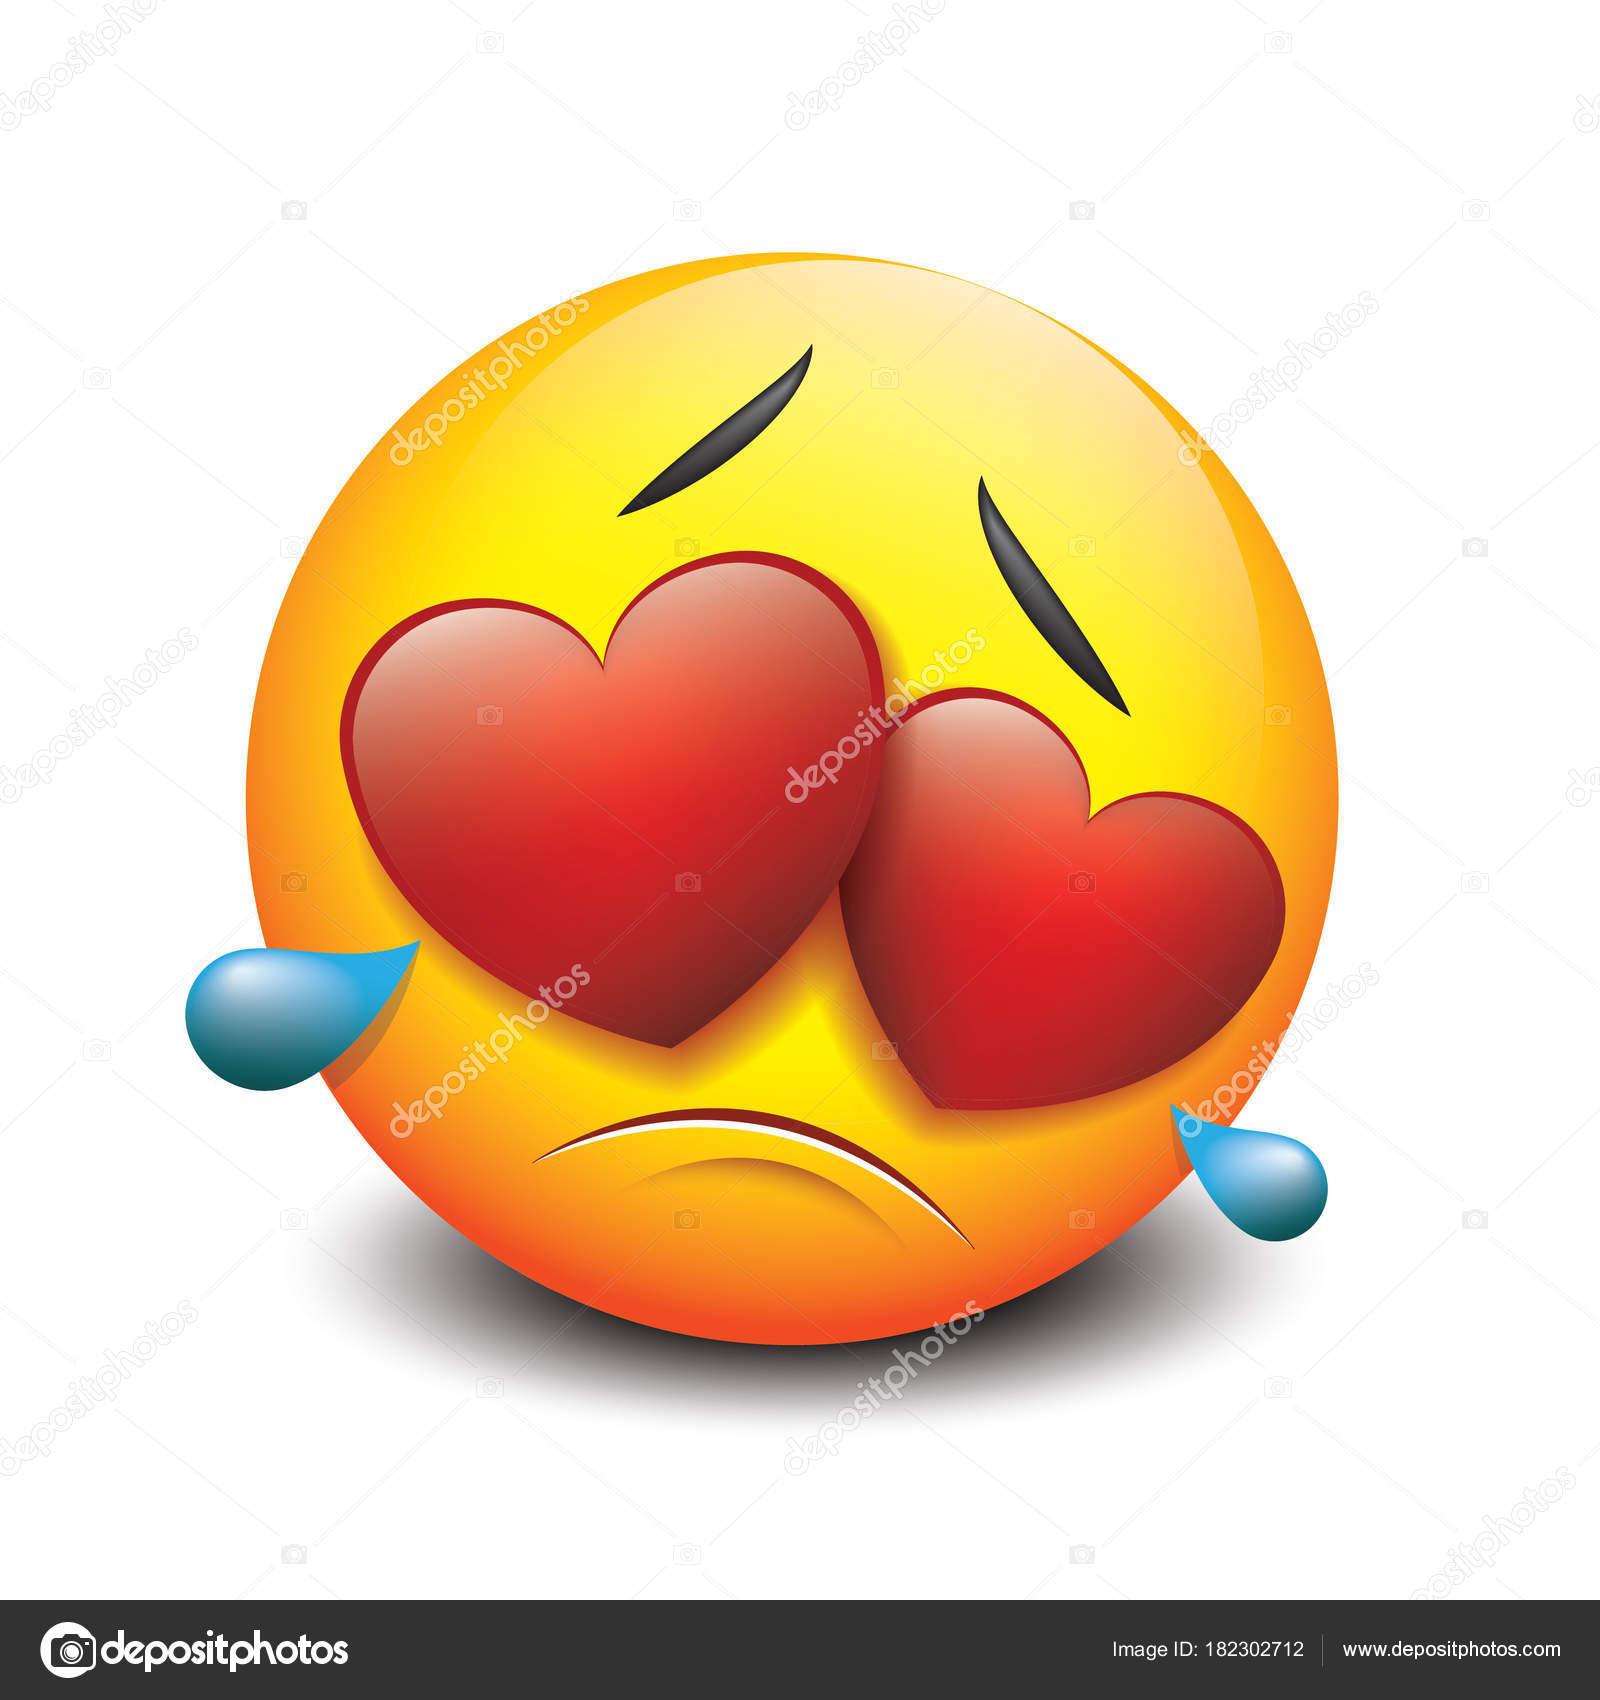 Cute love emojis | Cute Crying Sad Emoticon Love Emoji